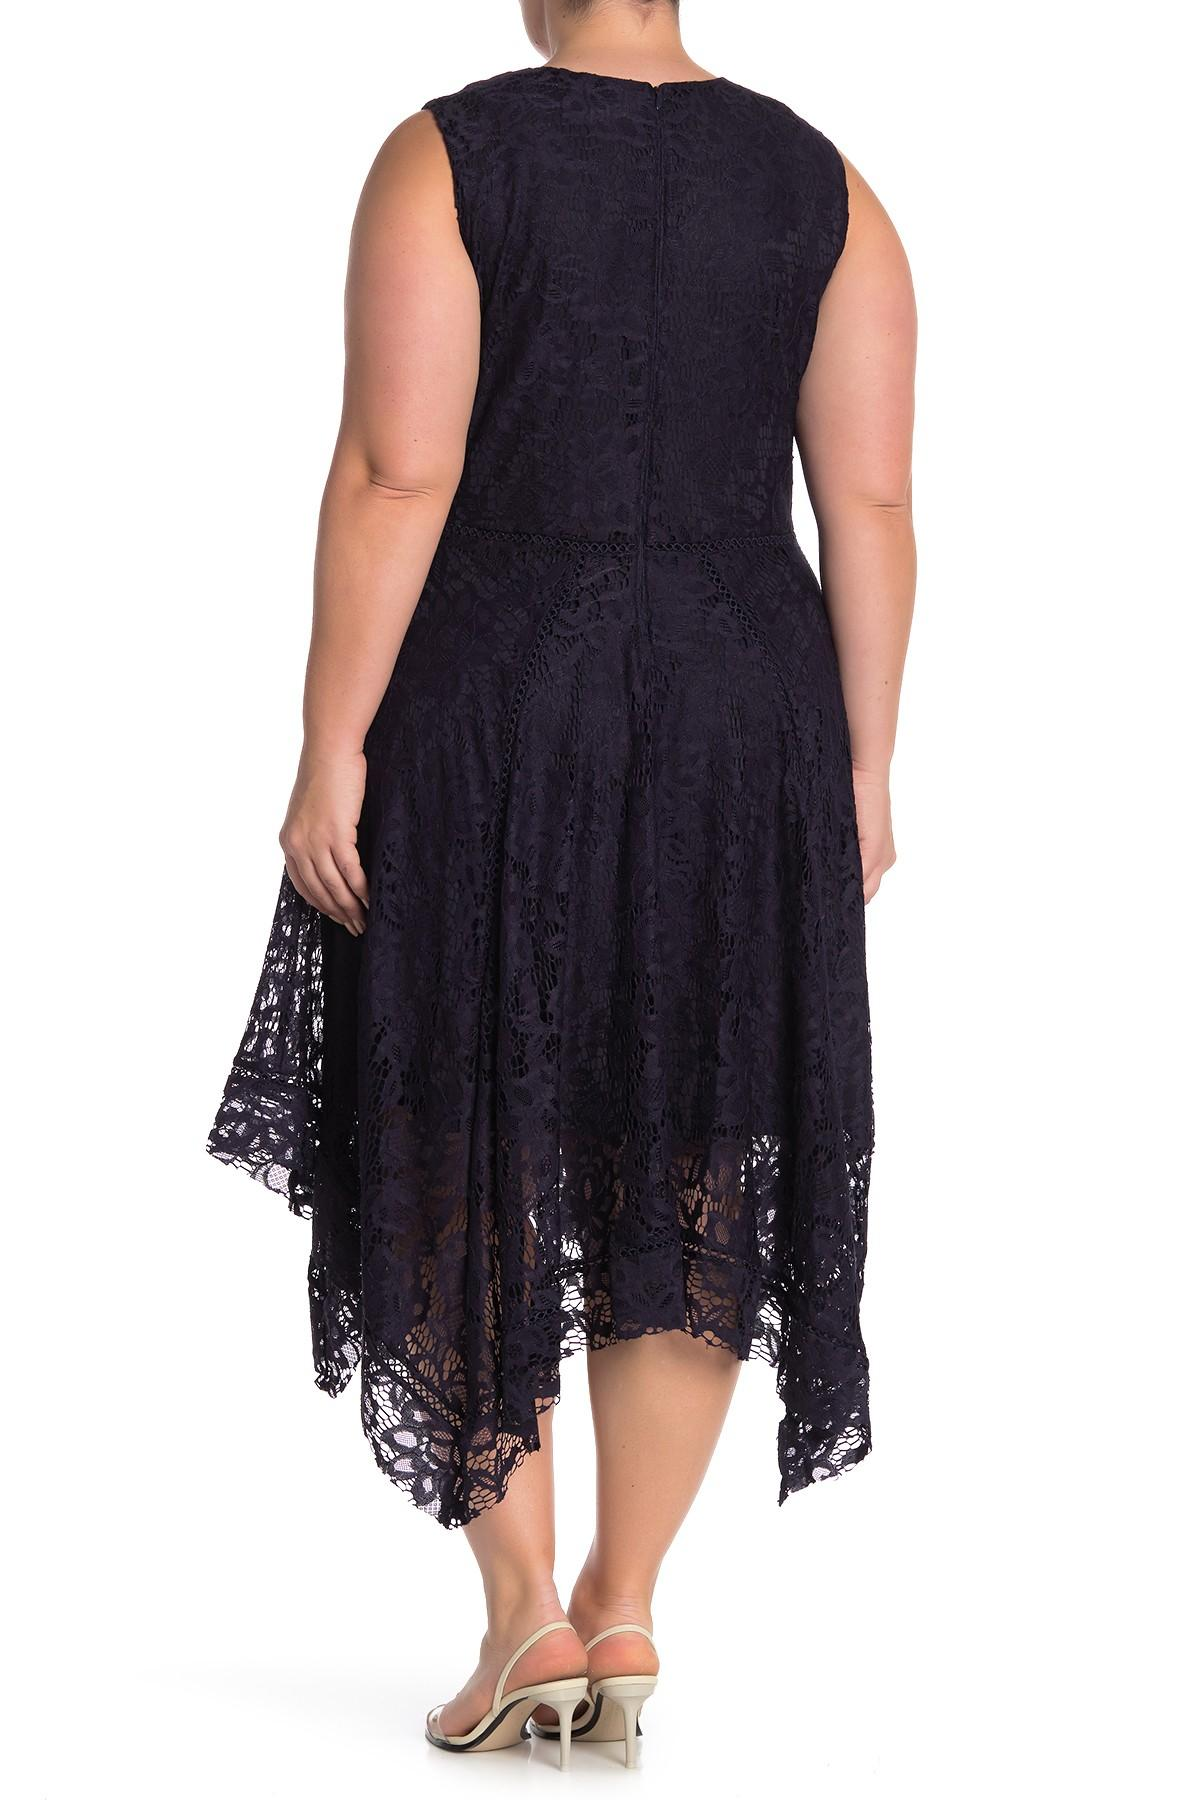 Lyst Taylor Dresses Floral Lace Sleeveless Midi Dress